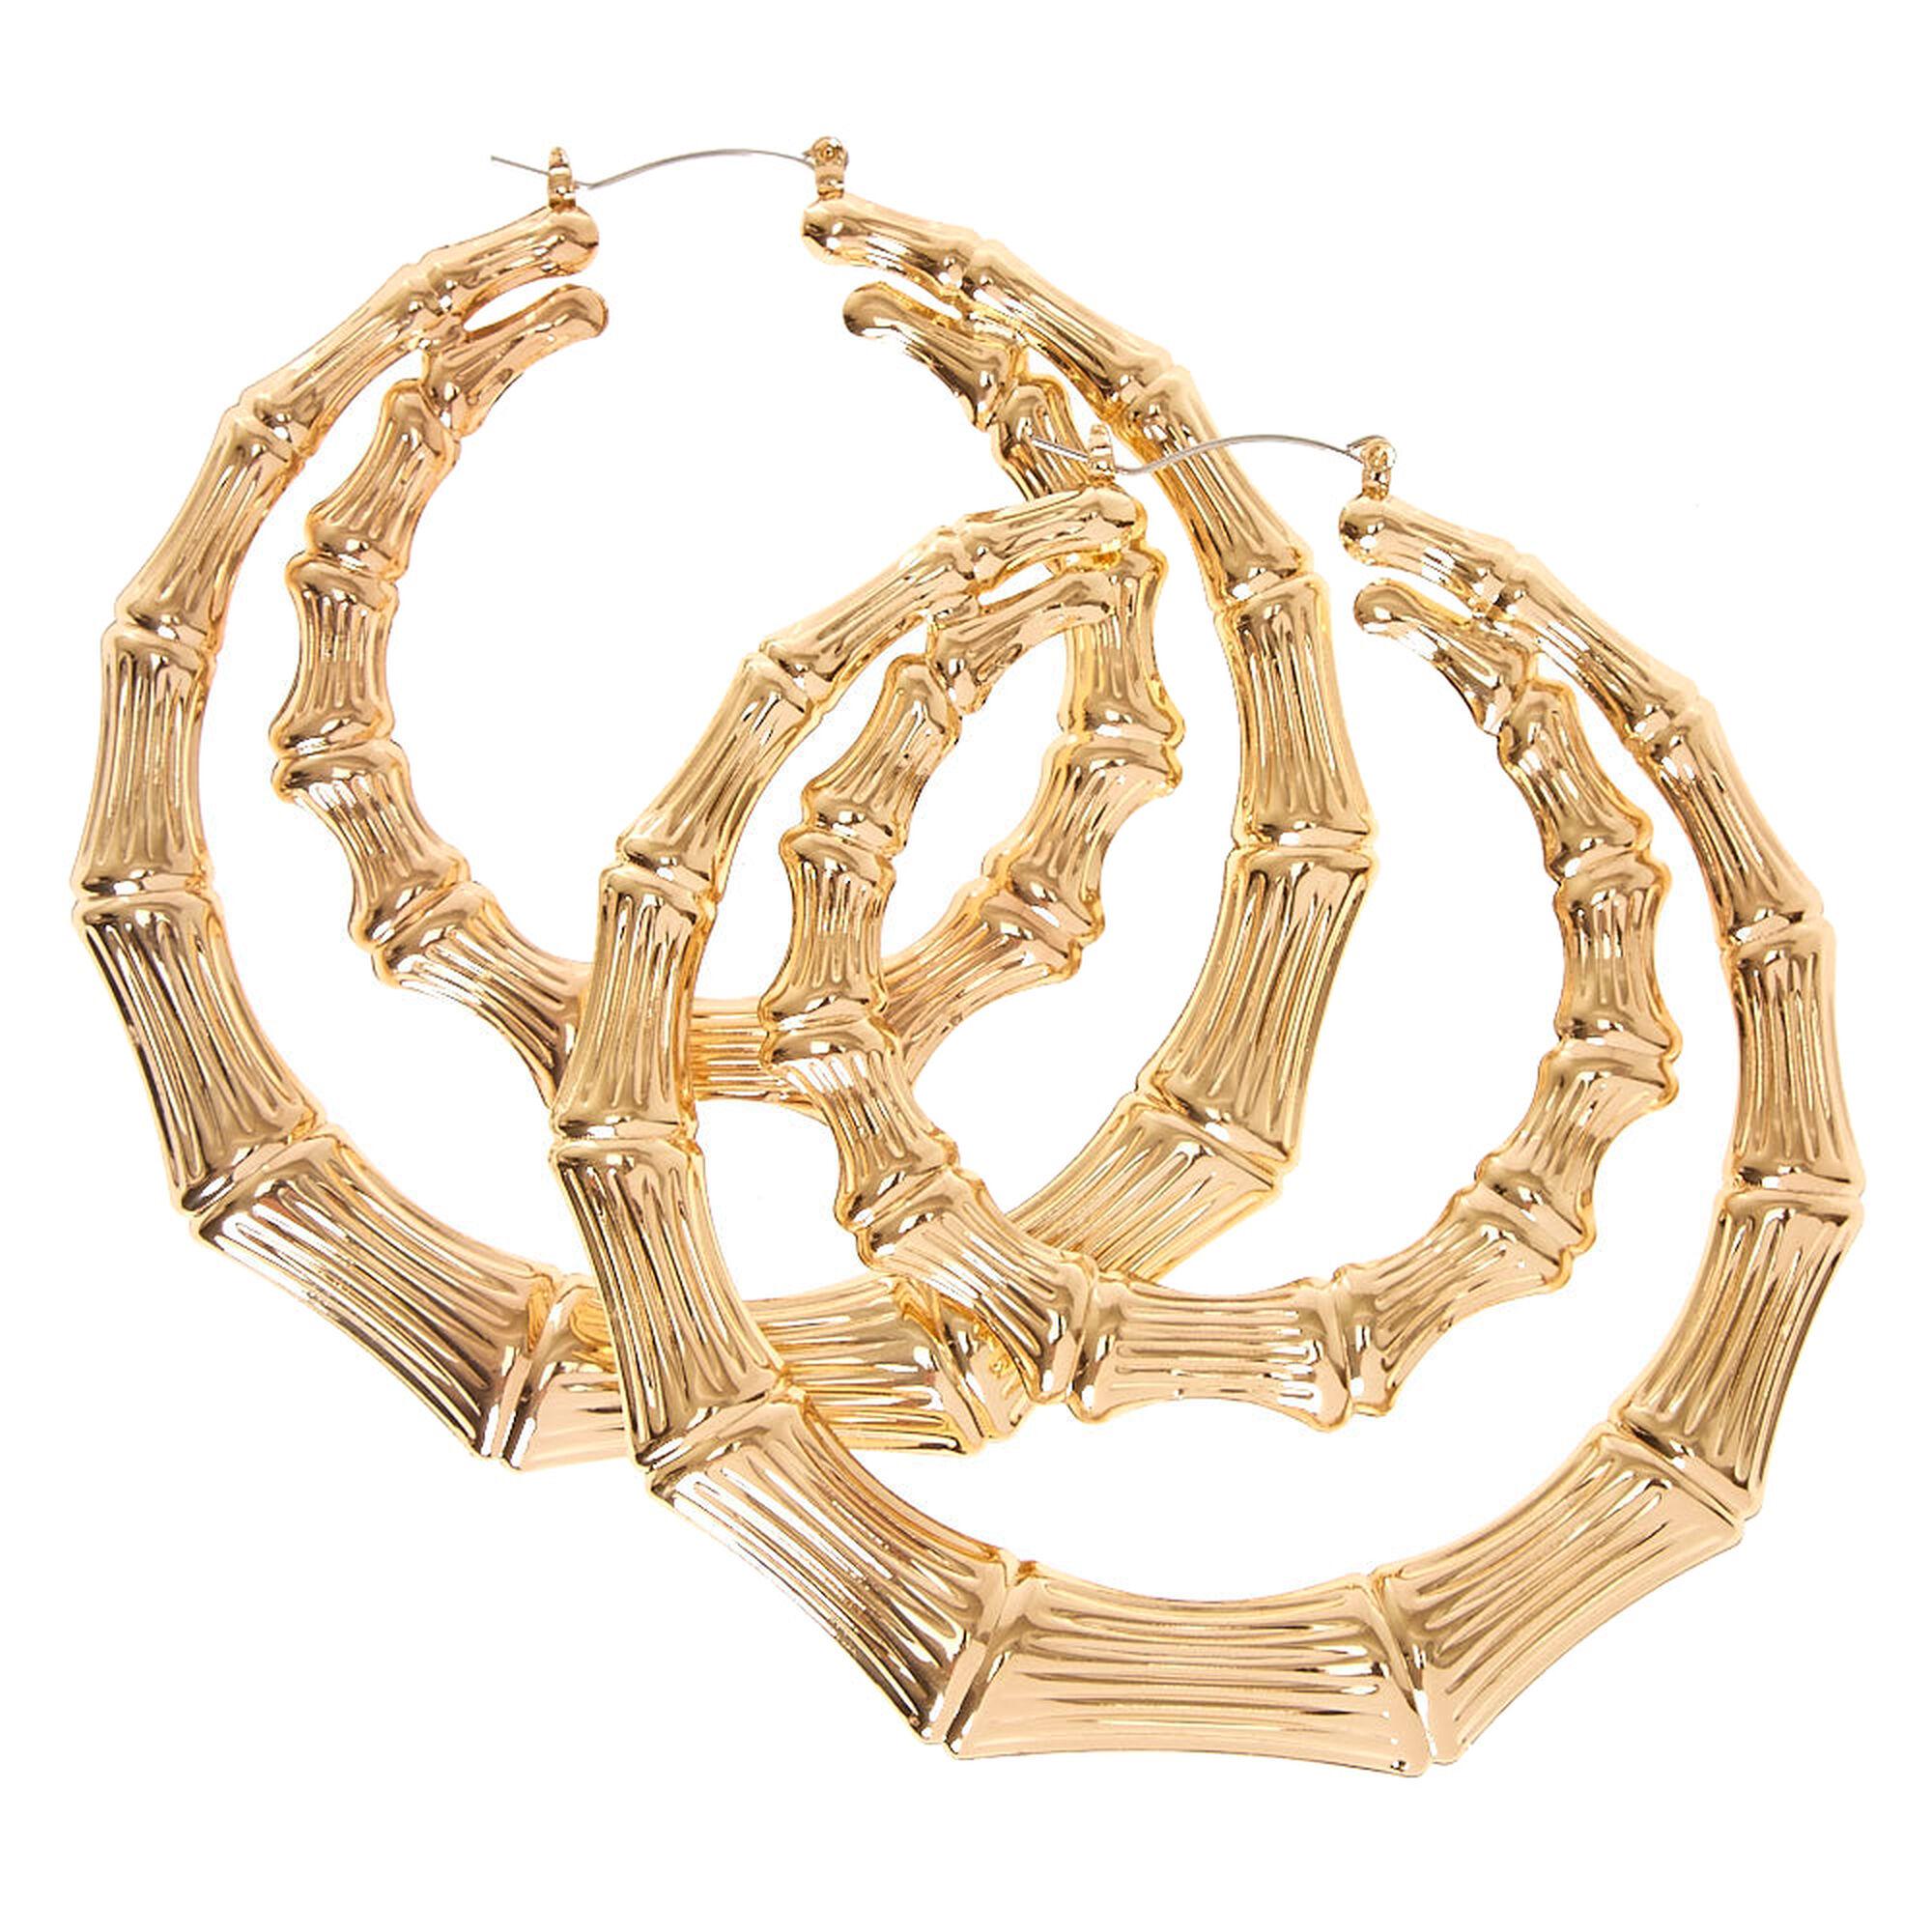 Gold Tone Double Bamboo Hoop Earrings